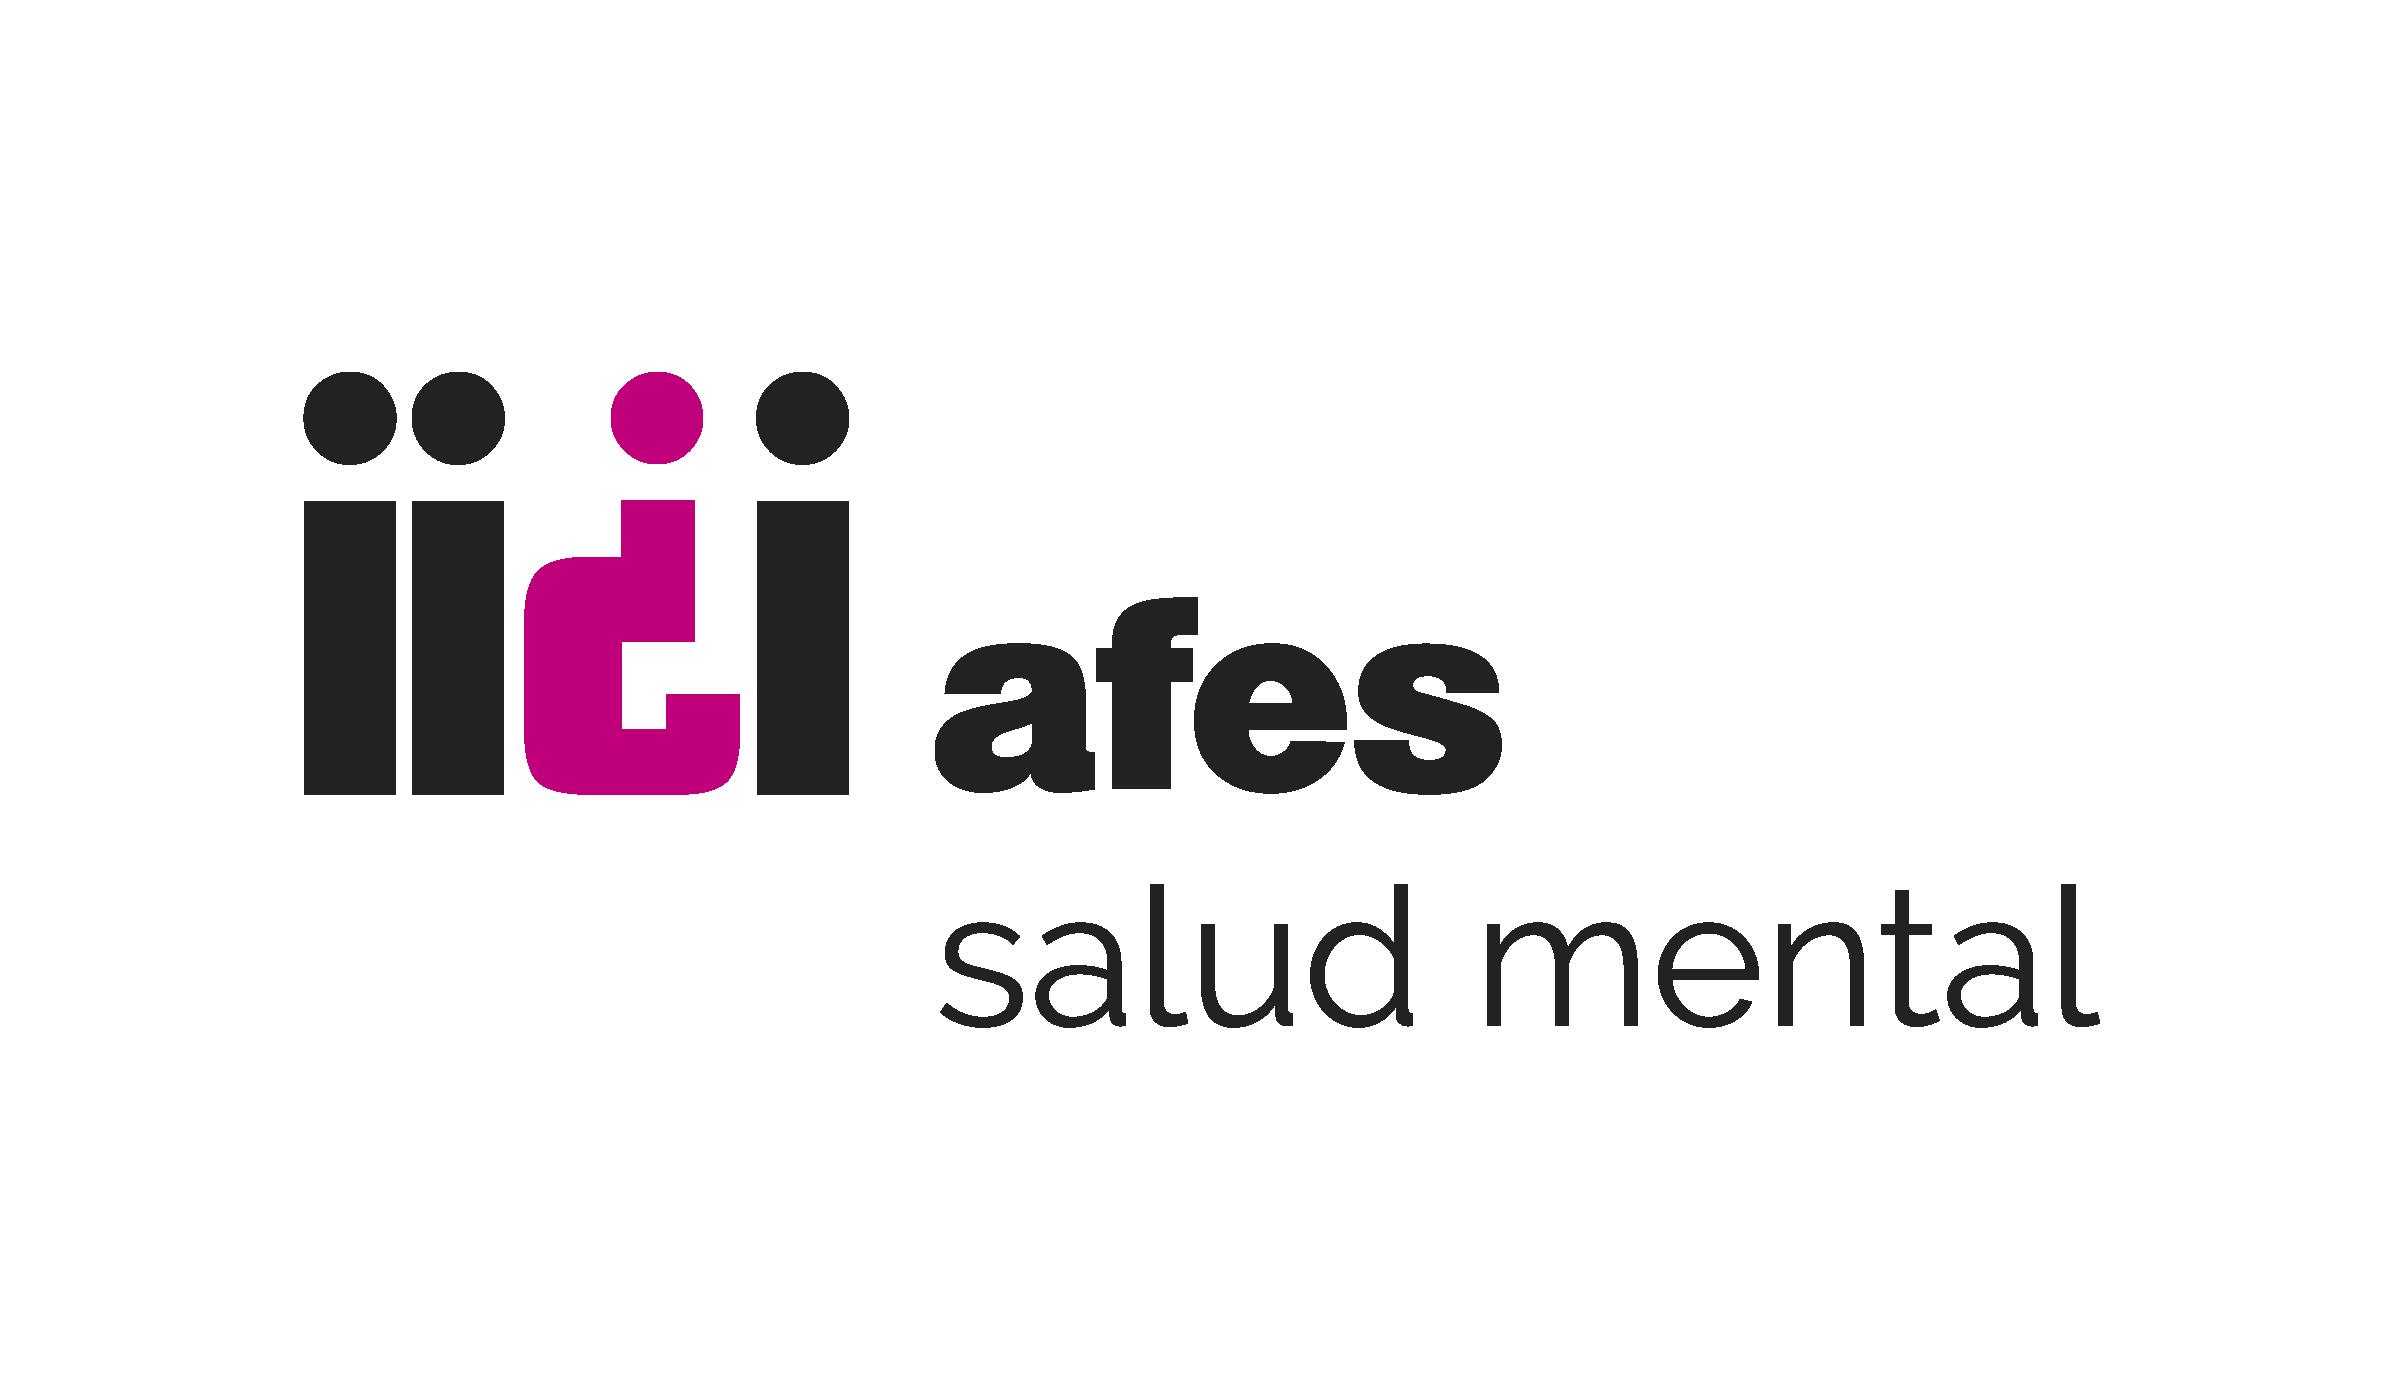 XXVIII Jornadas Estatales FEAE - Tenerife 2019